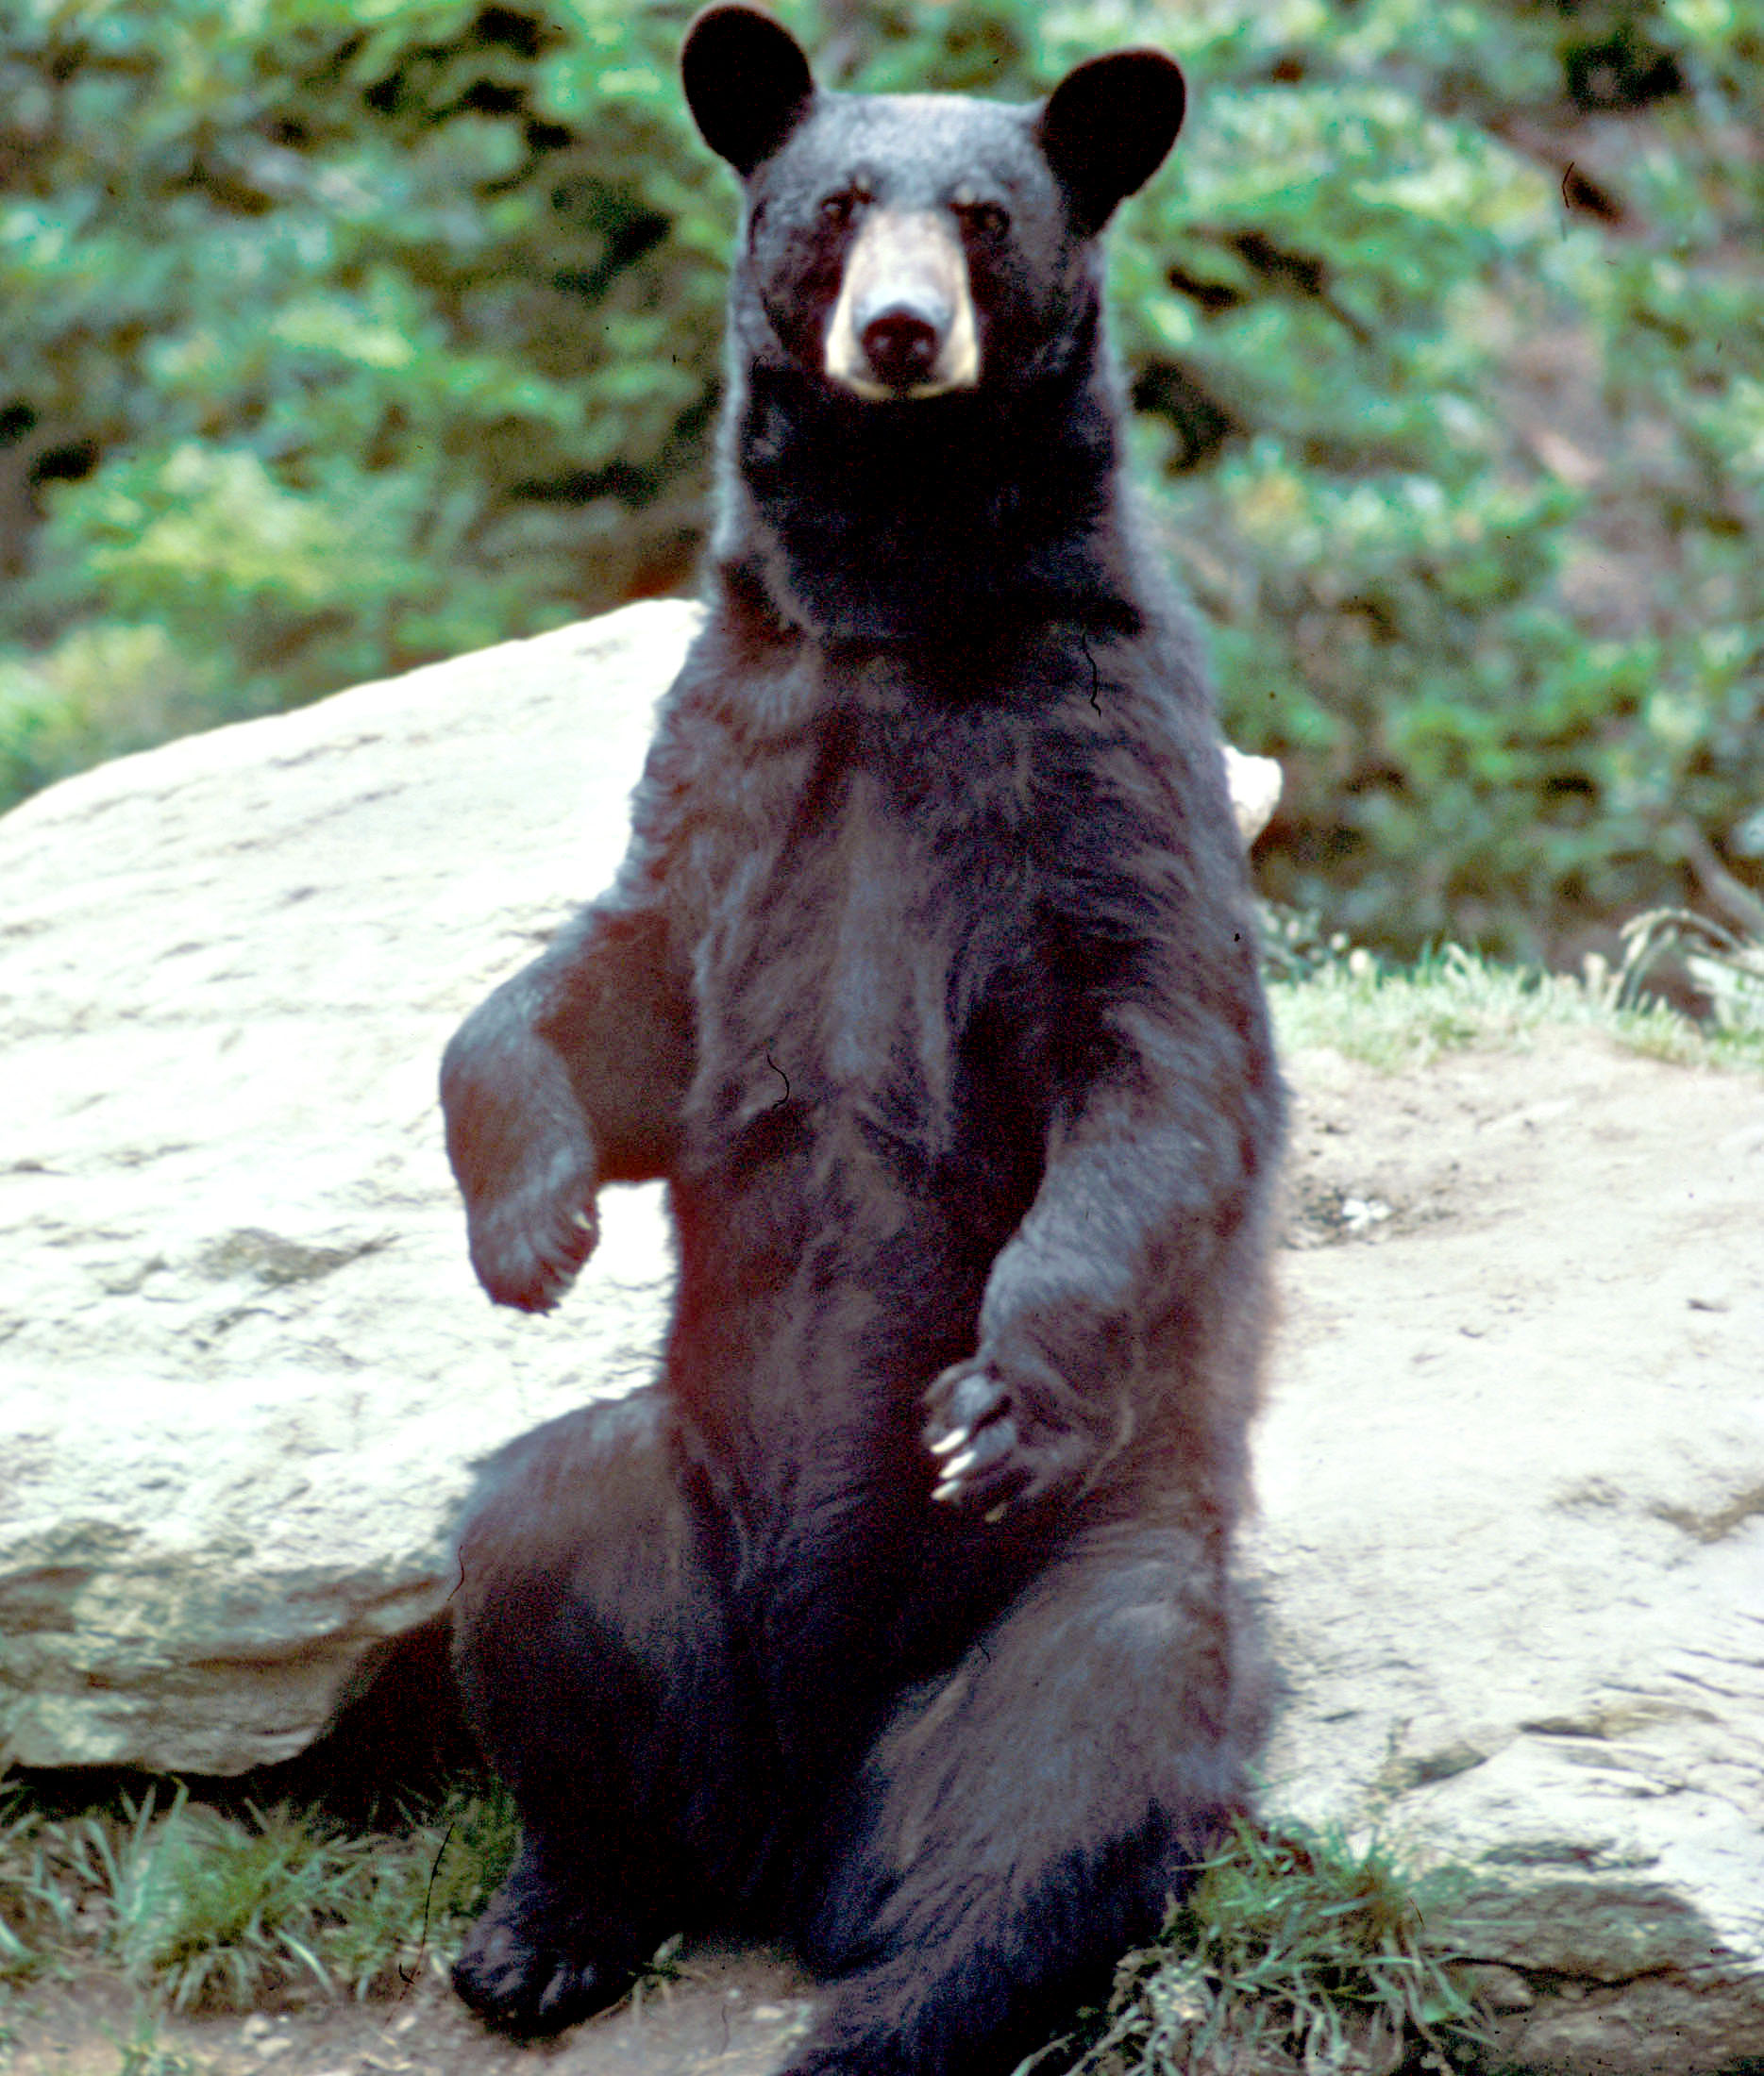 Black+Bear